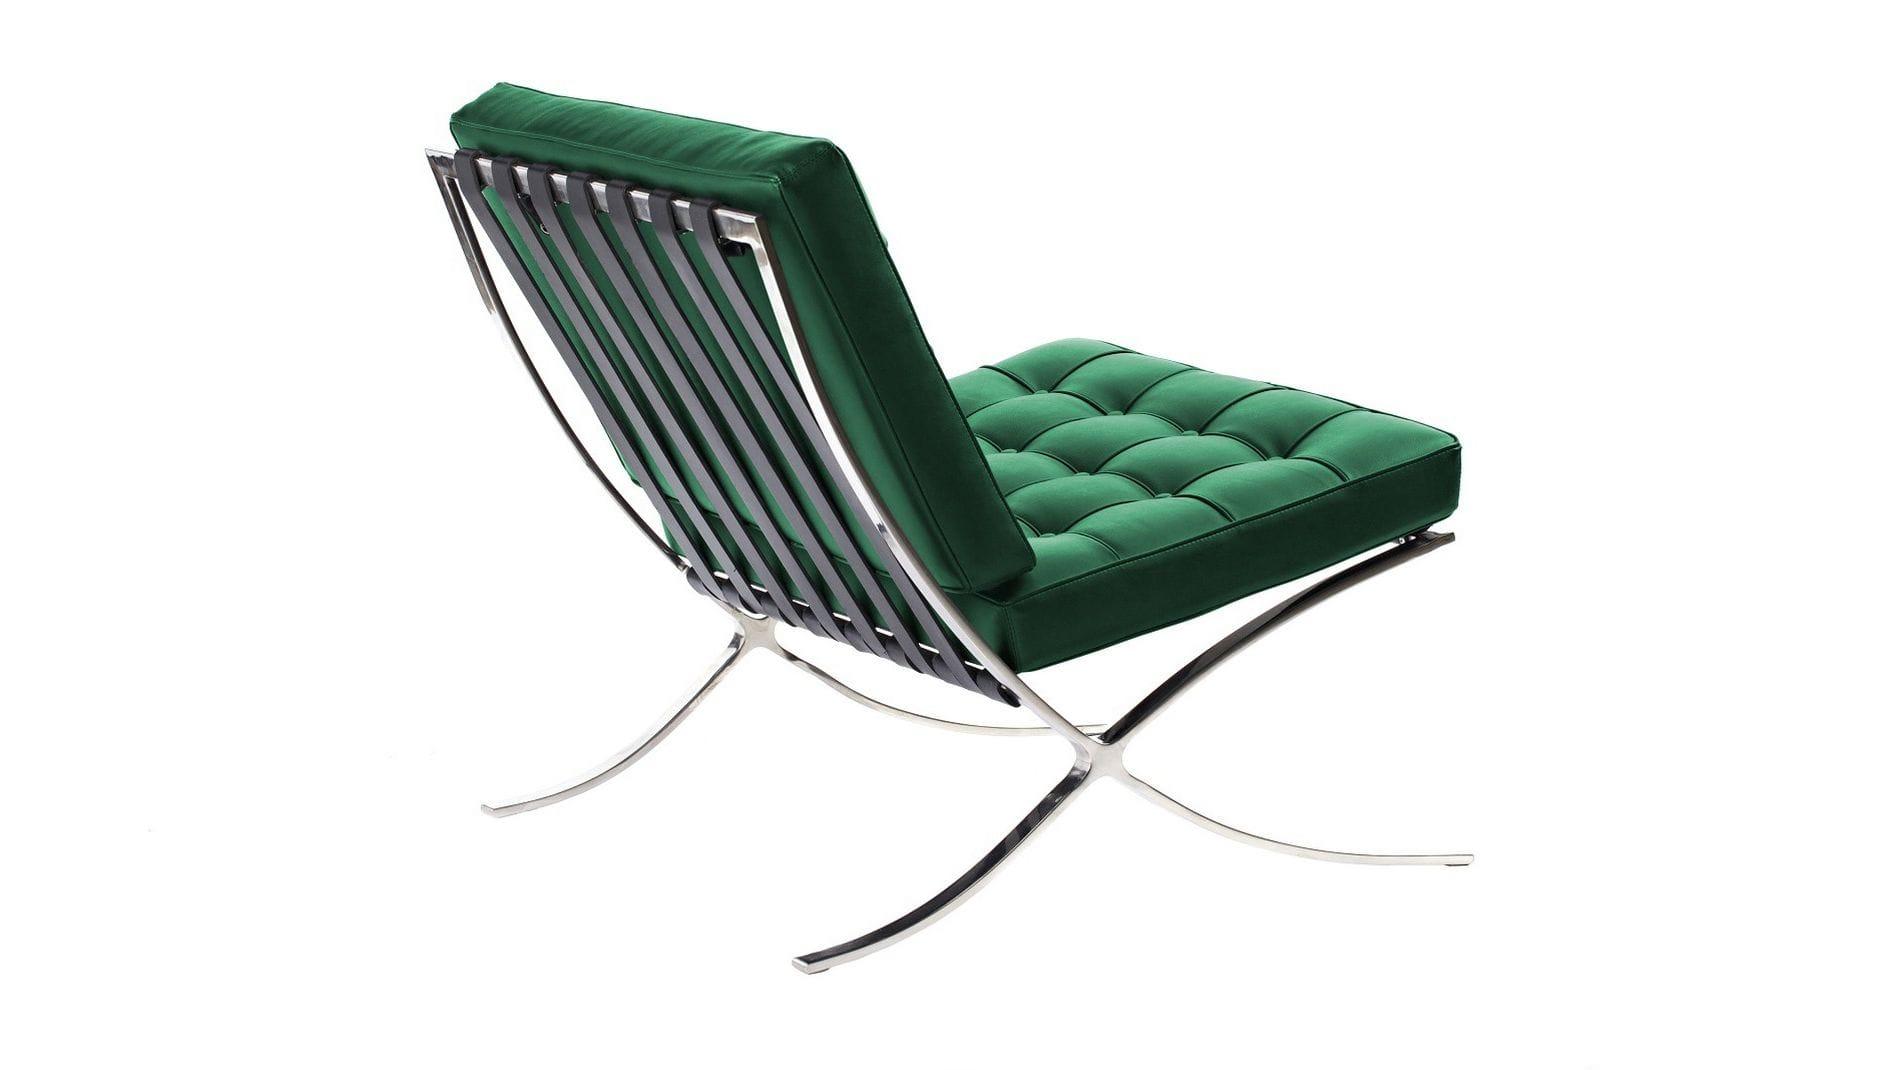 Кресло Barcelona Chair Зелёная Кожа Класса Премиум Р